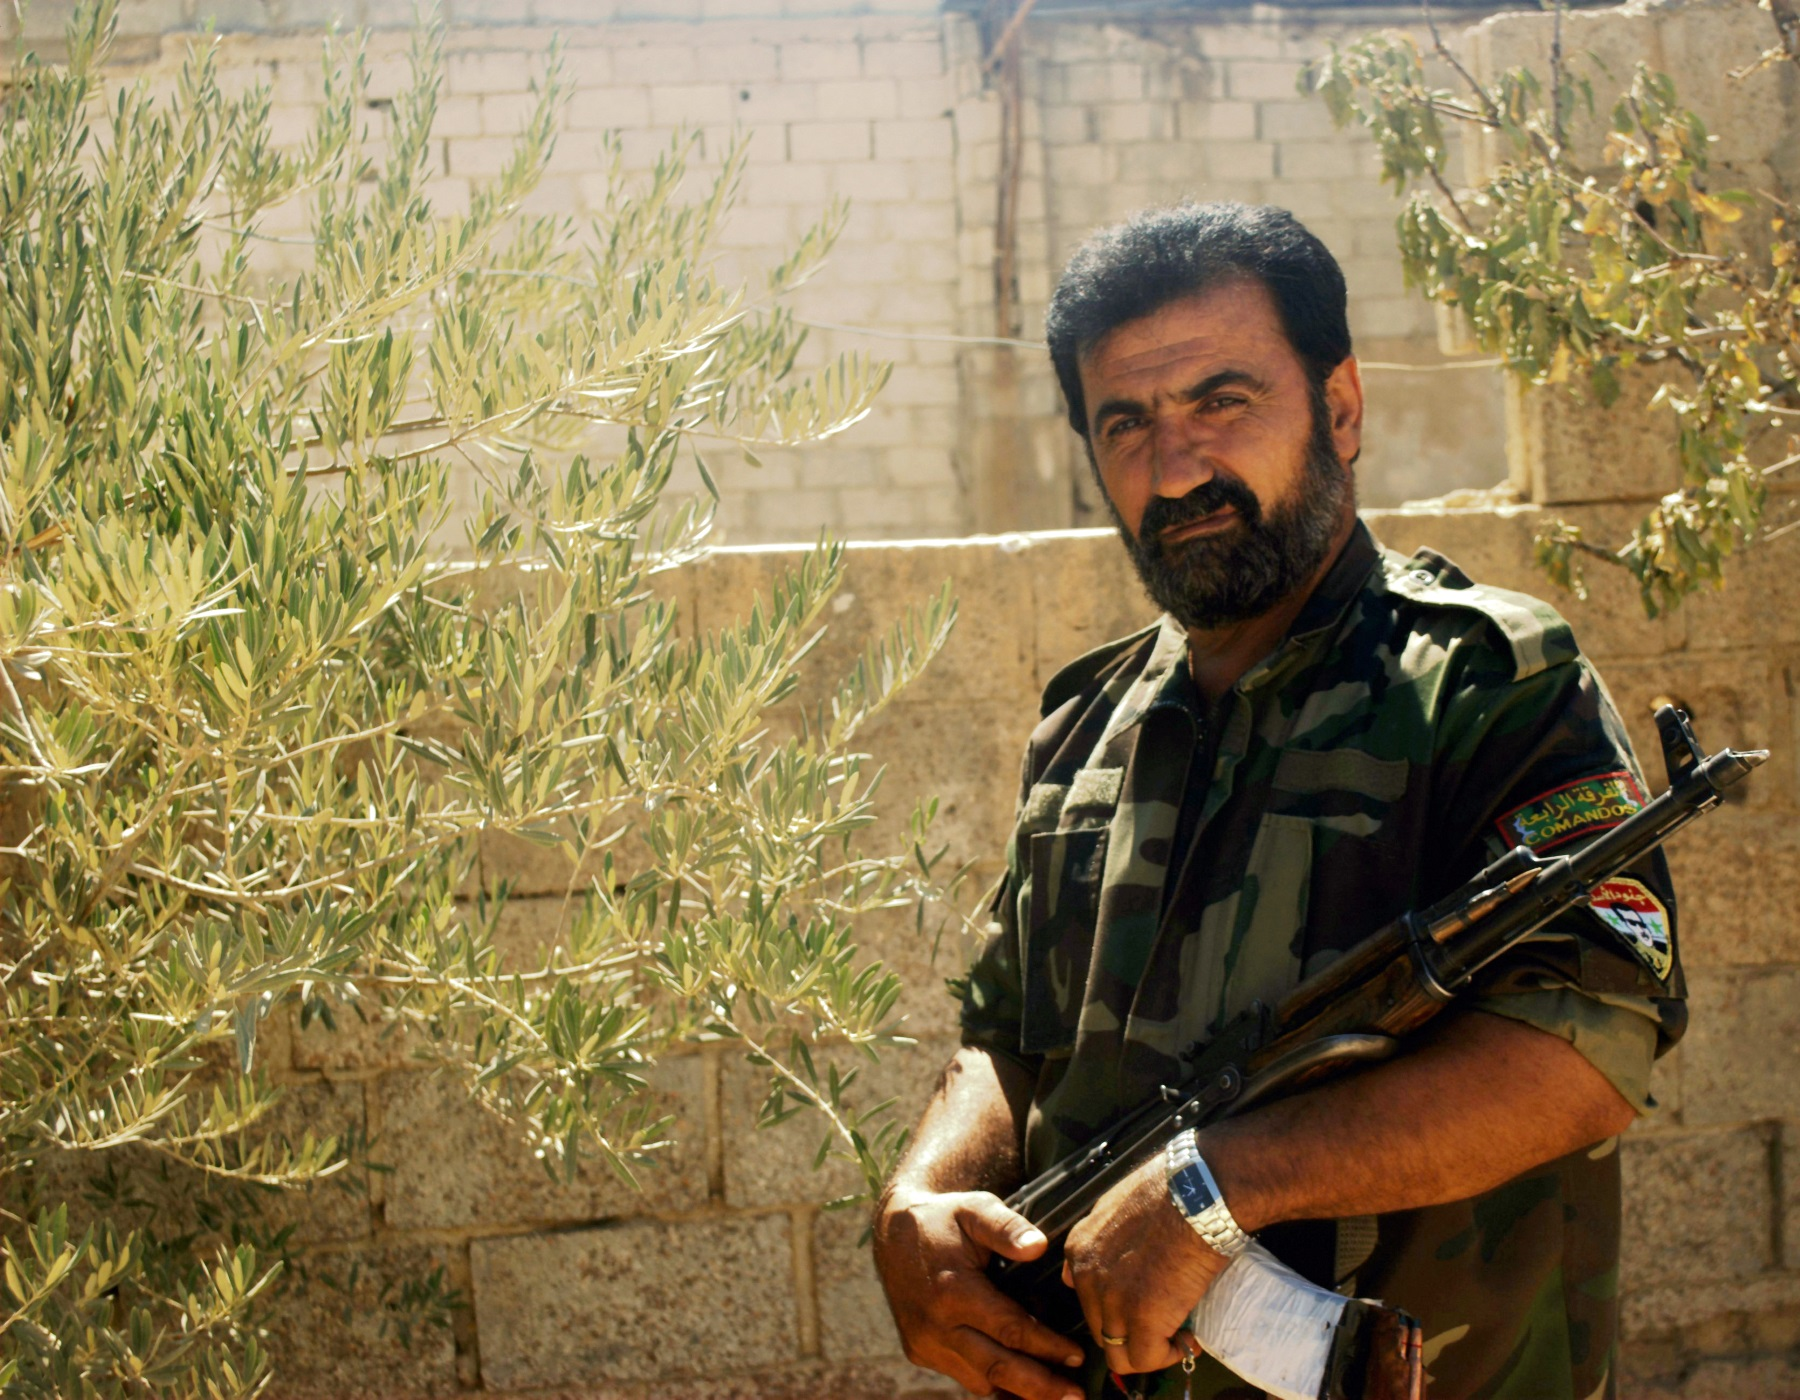 00-syrian-soldier-071216